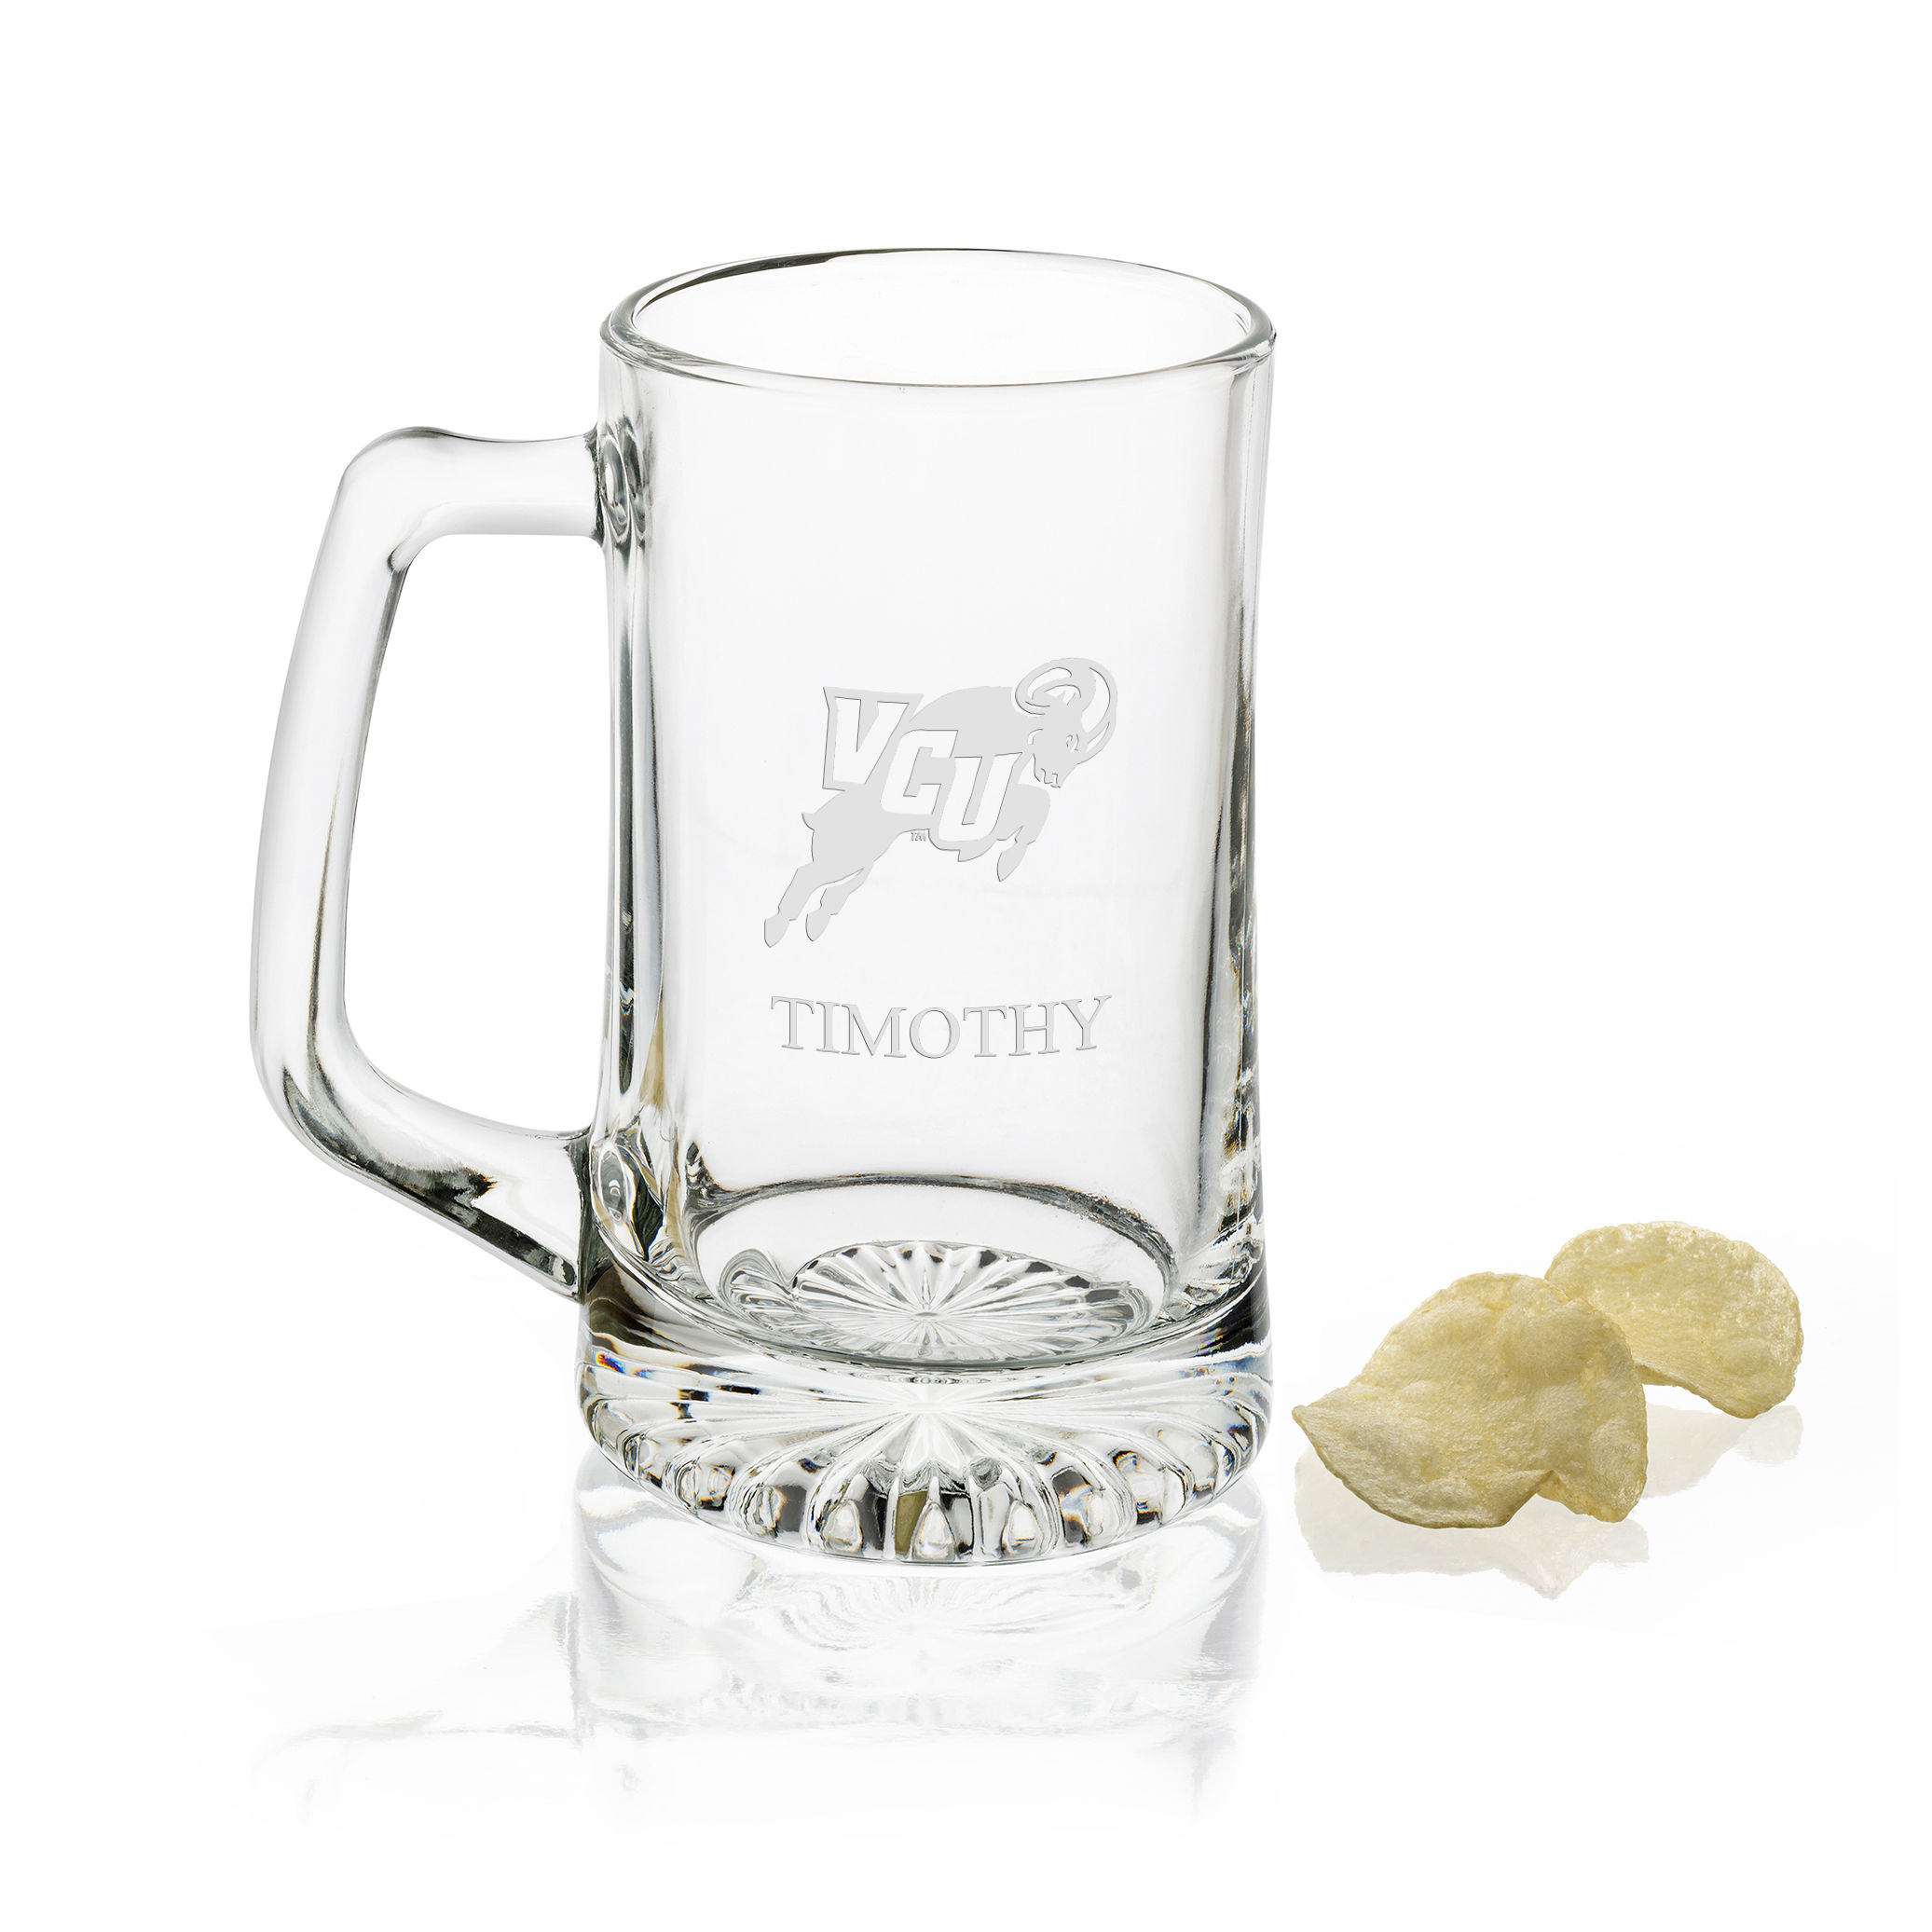 VCU 25 oz Beer Mug